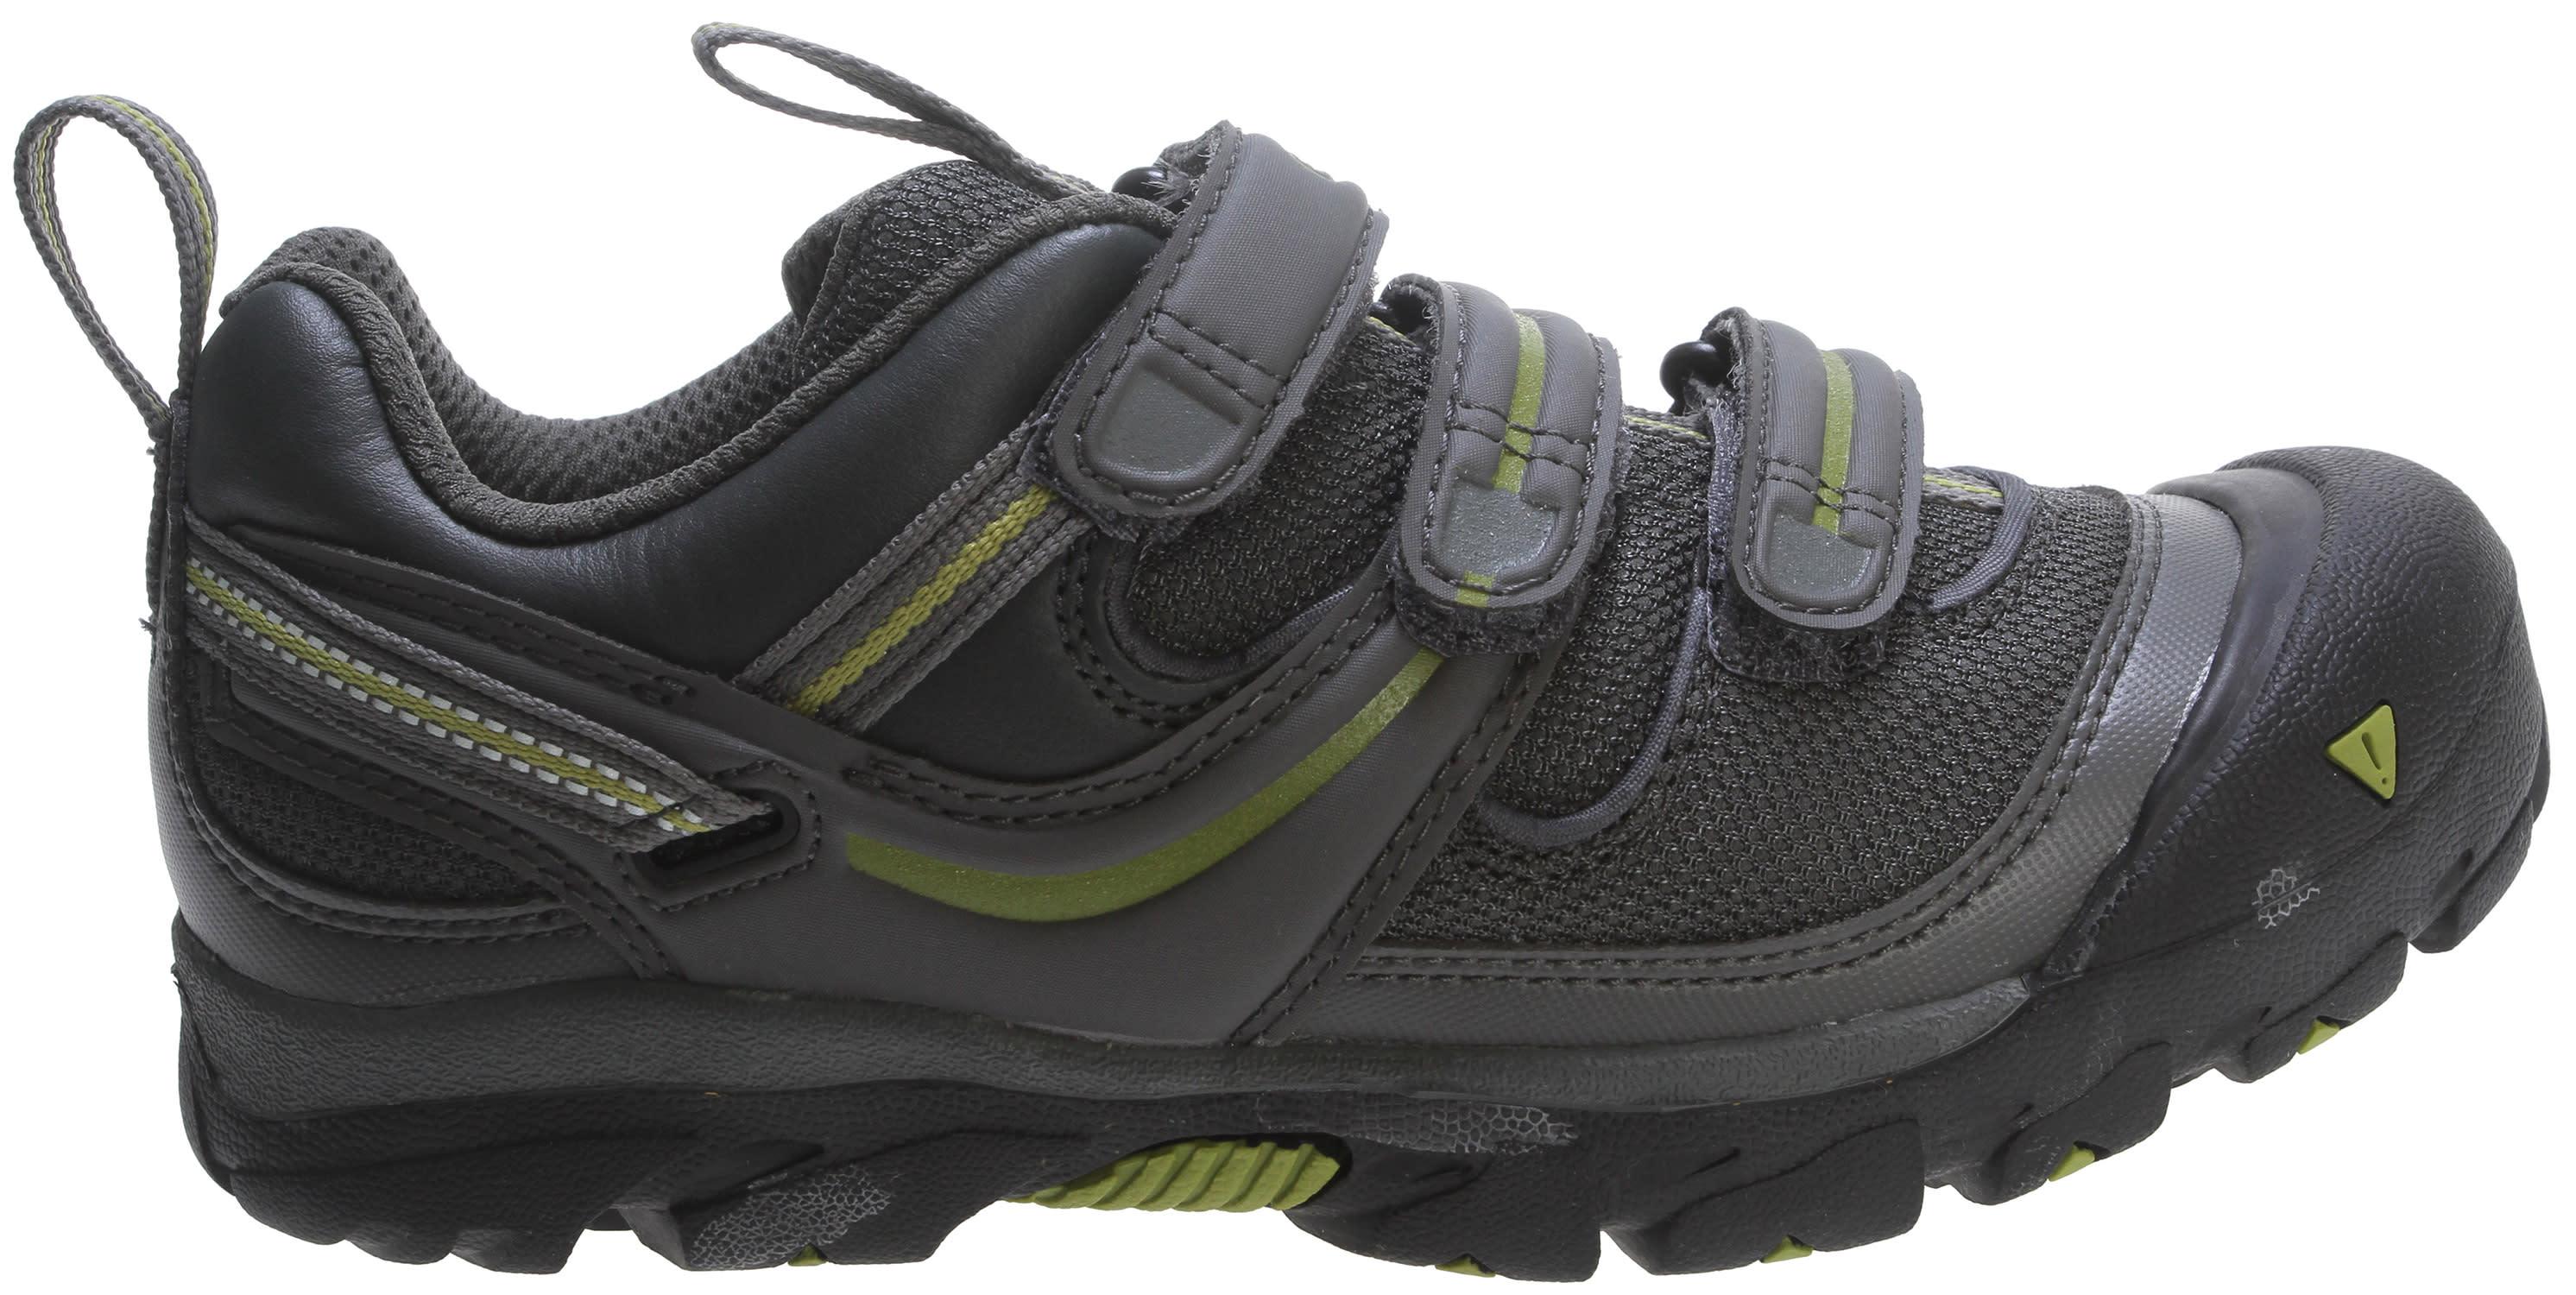 db42a9e859d4 Keen Springwater II Bike Shoes - thumbnail 1